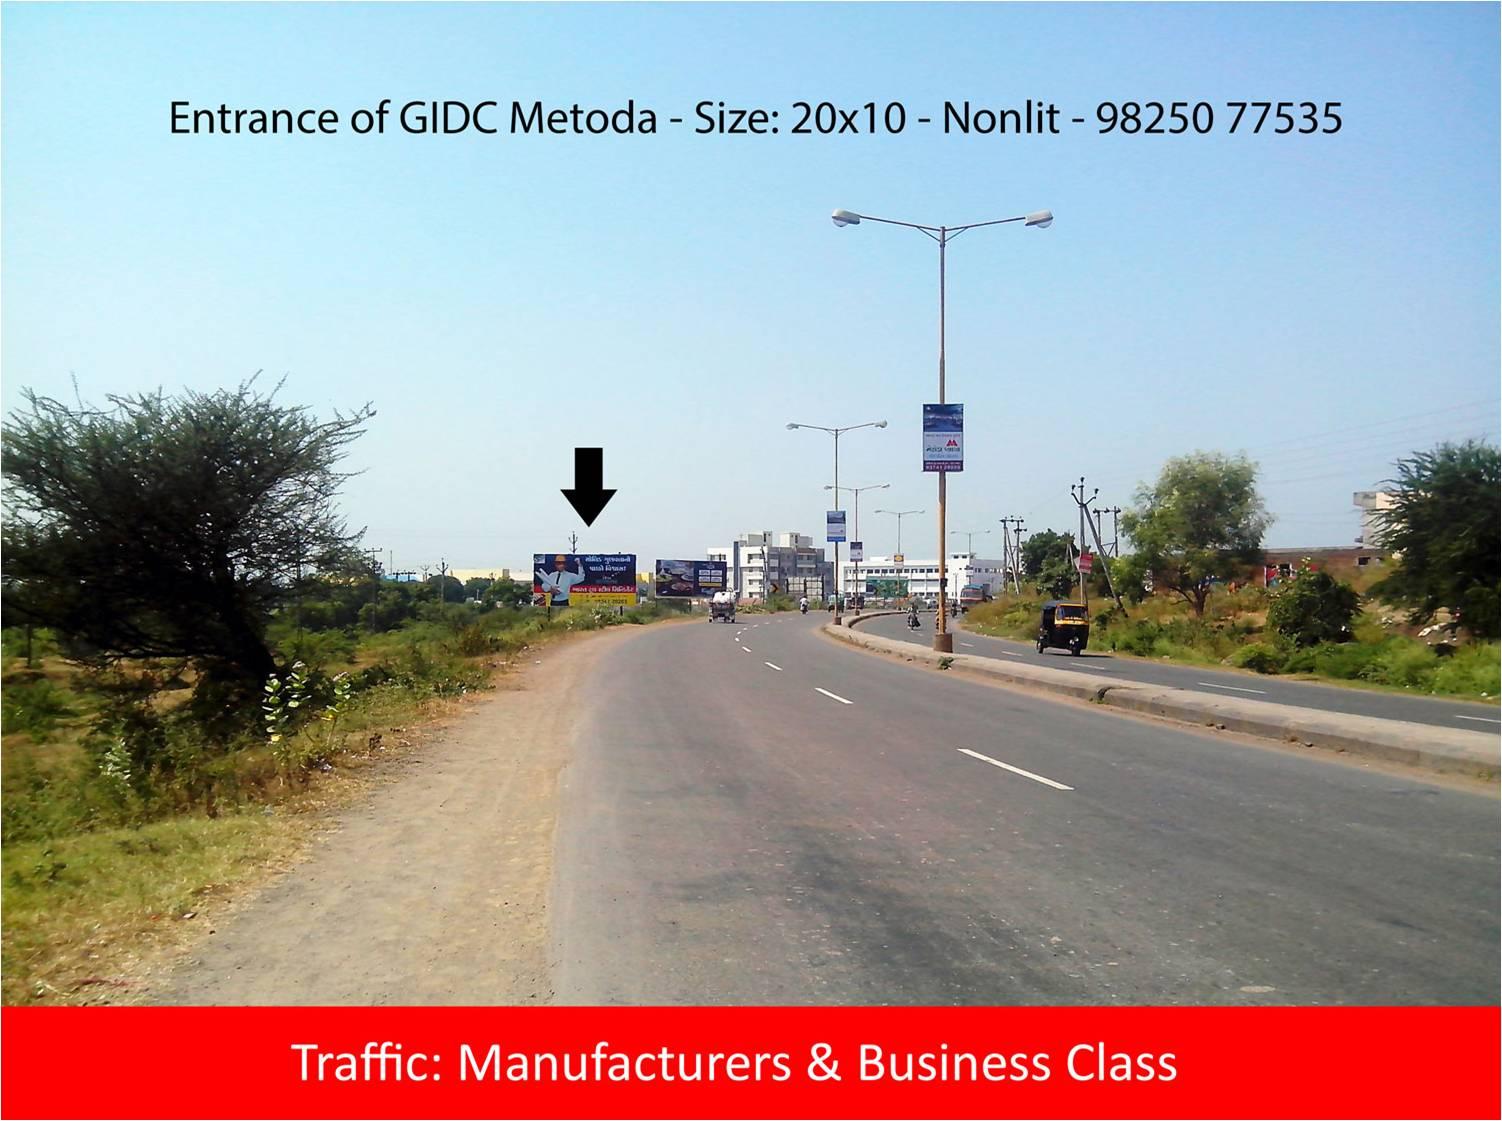 Entrance Of GIDC Metoda